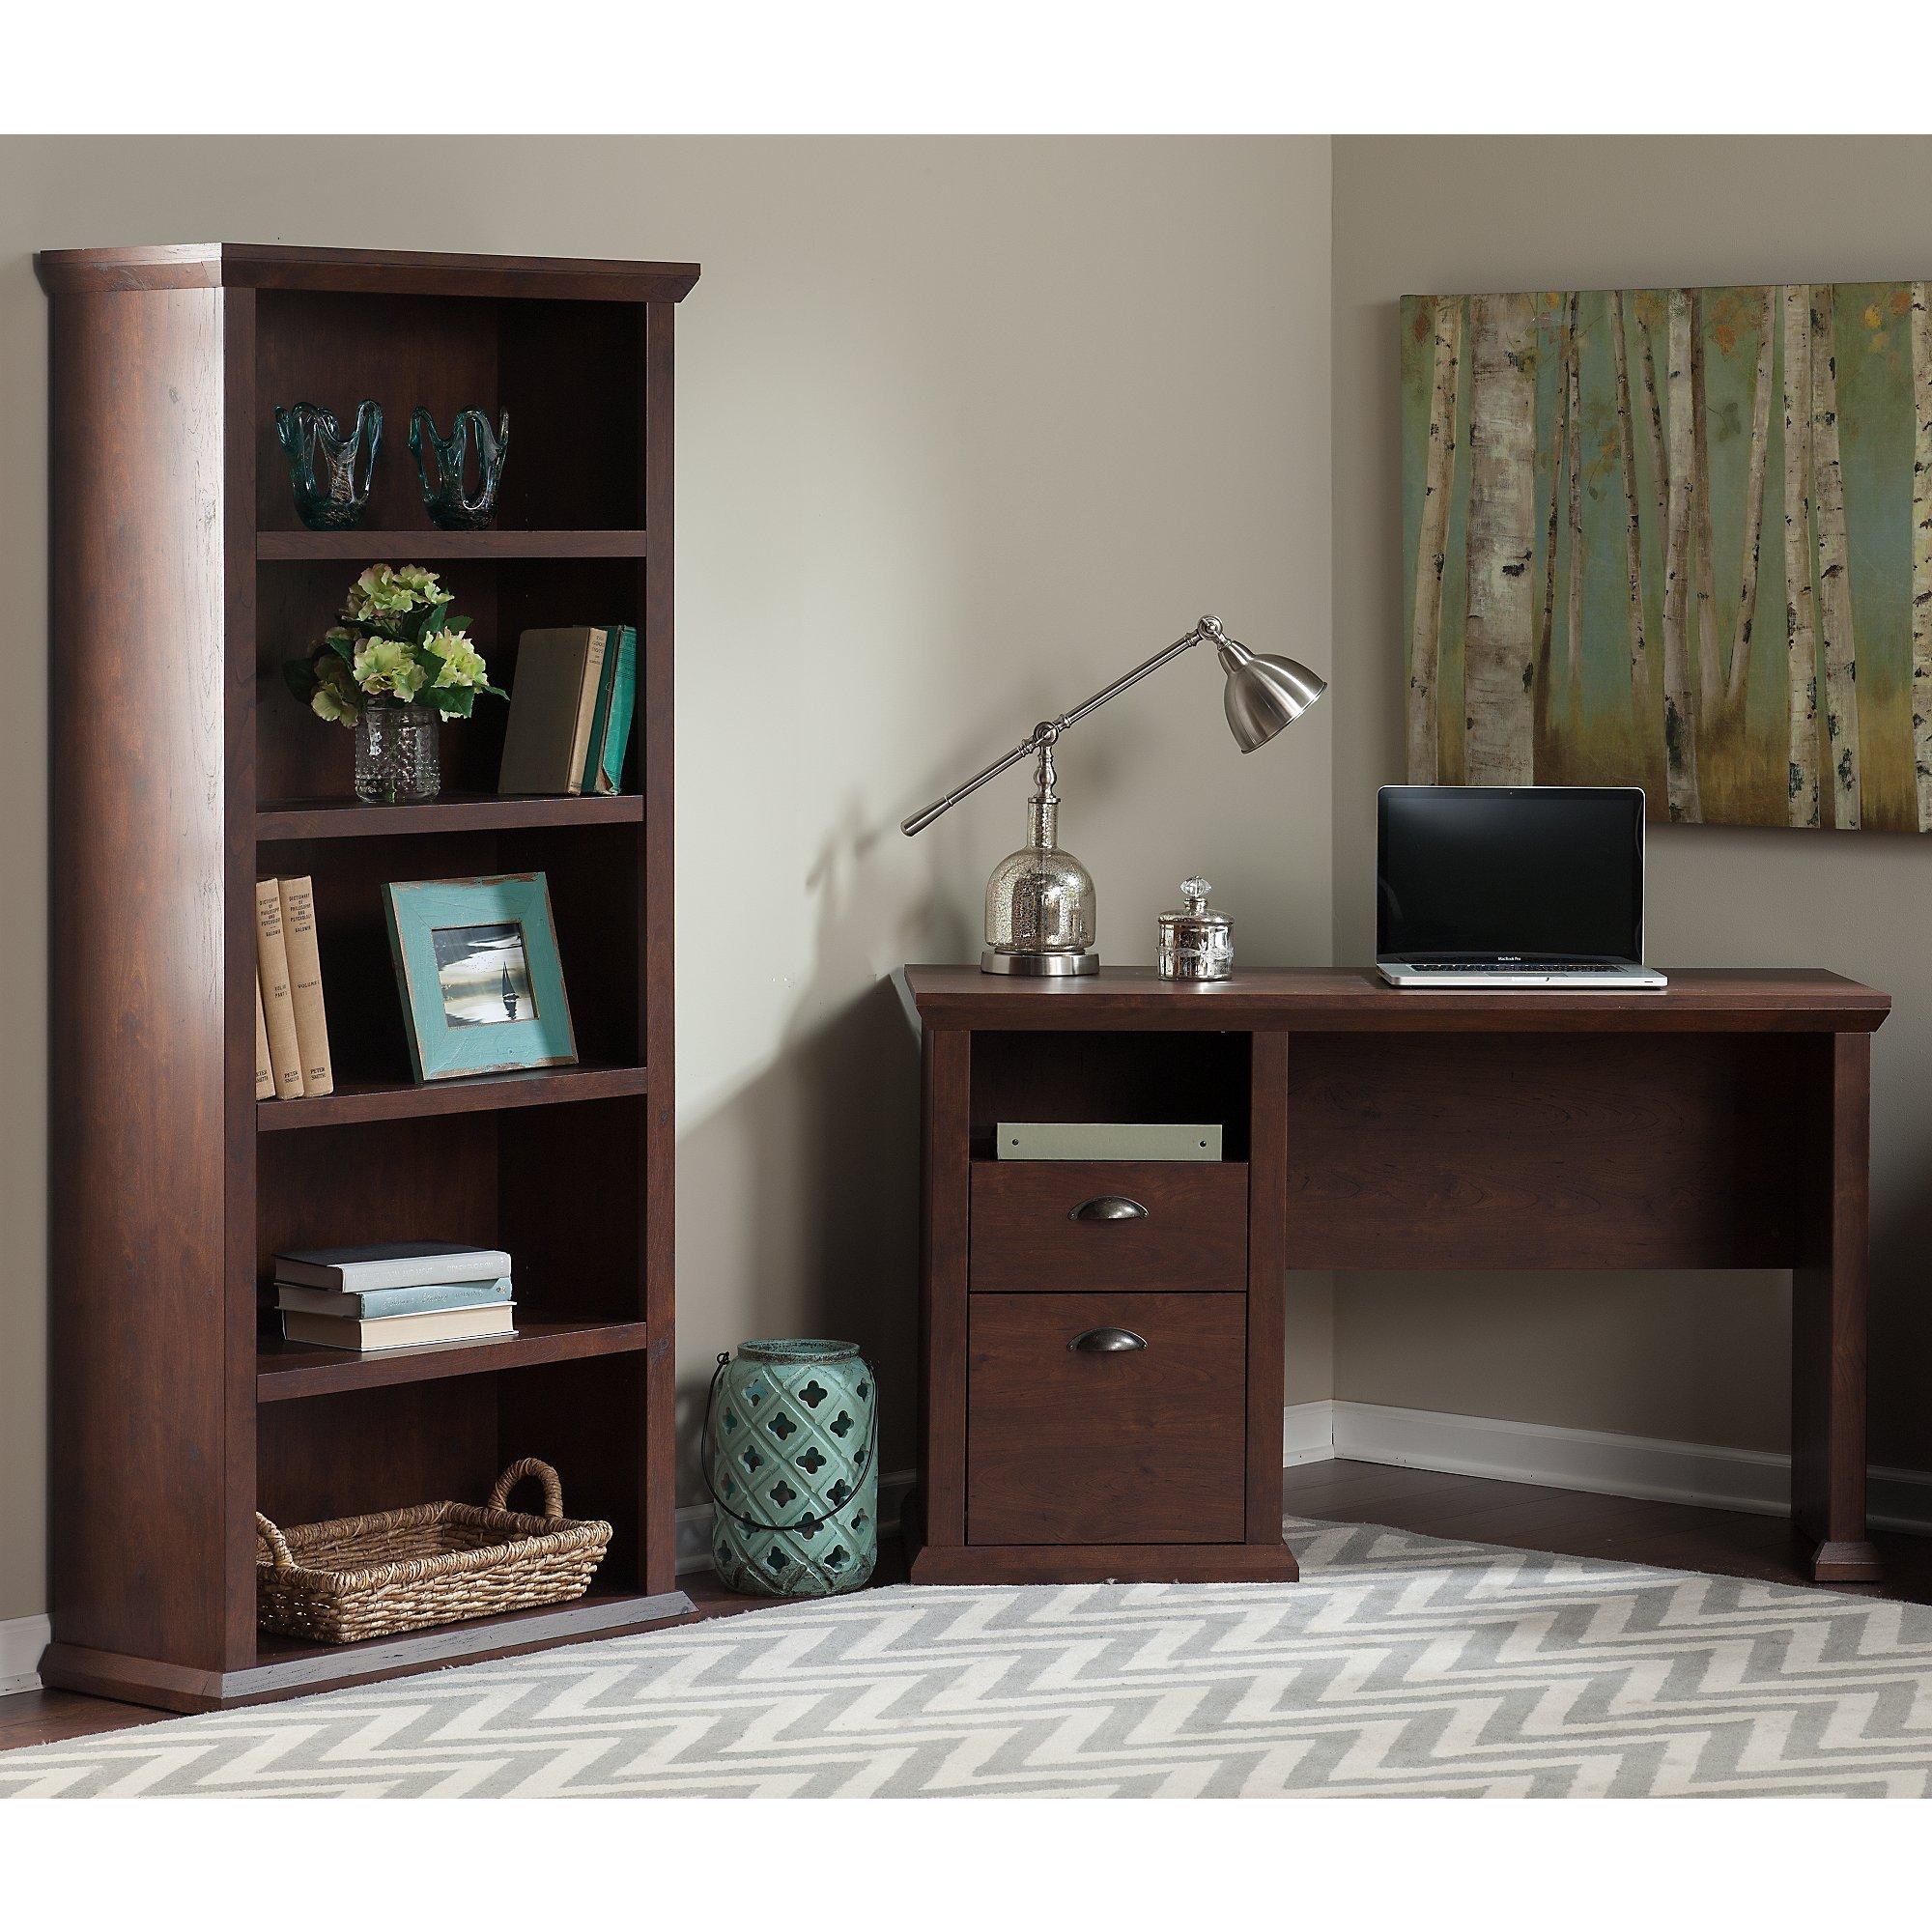 Bush Furniture Yorktown Home Office Desk and Bookcase